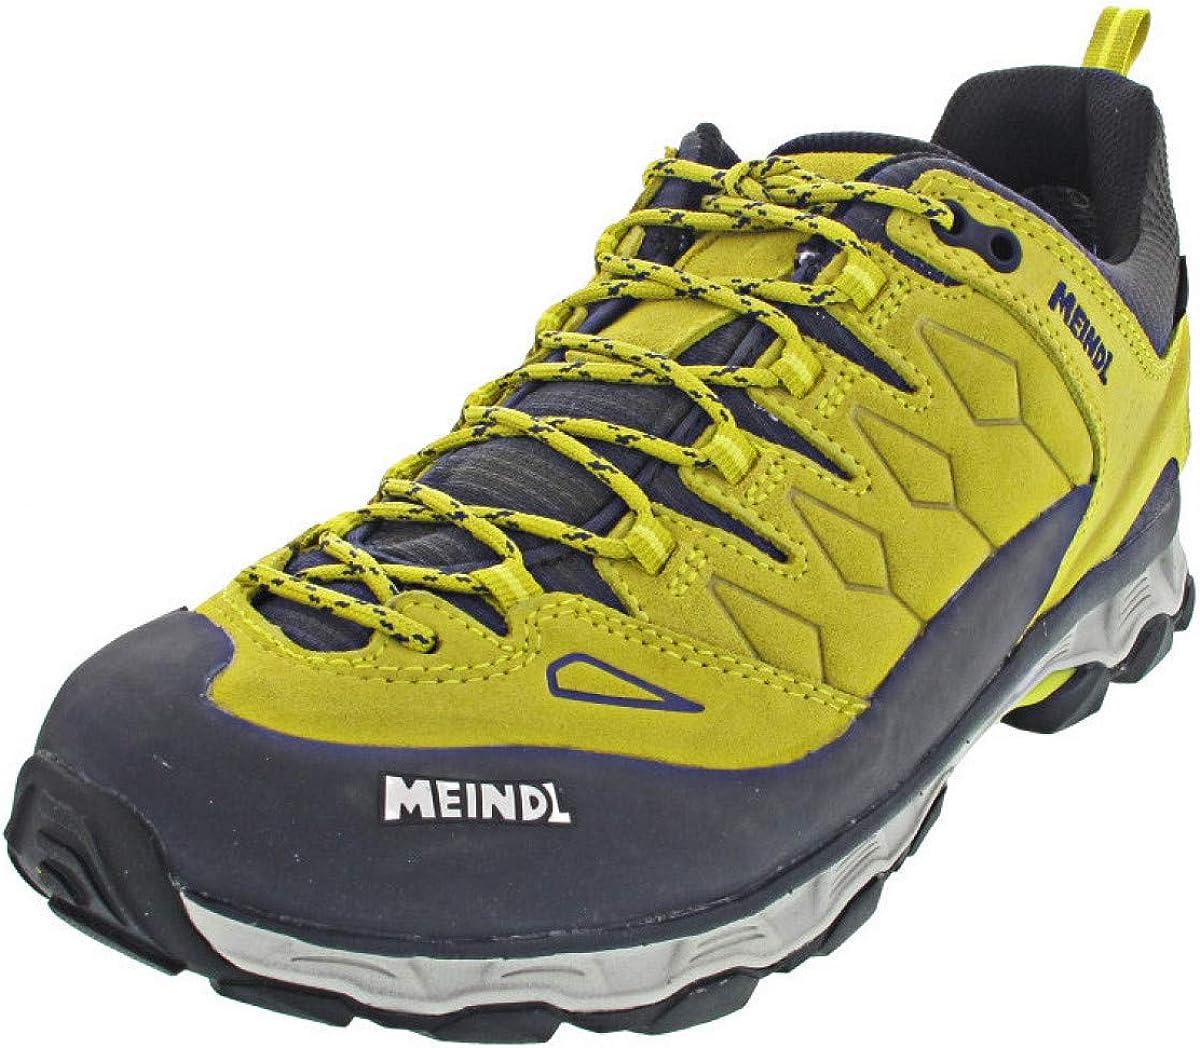 Chaussures de Randonn/ée Hautes Homme Meindl Multifuntionsschuh Nebraska Mid GTX